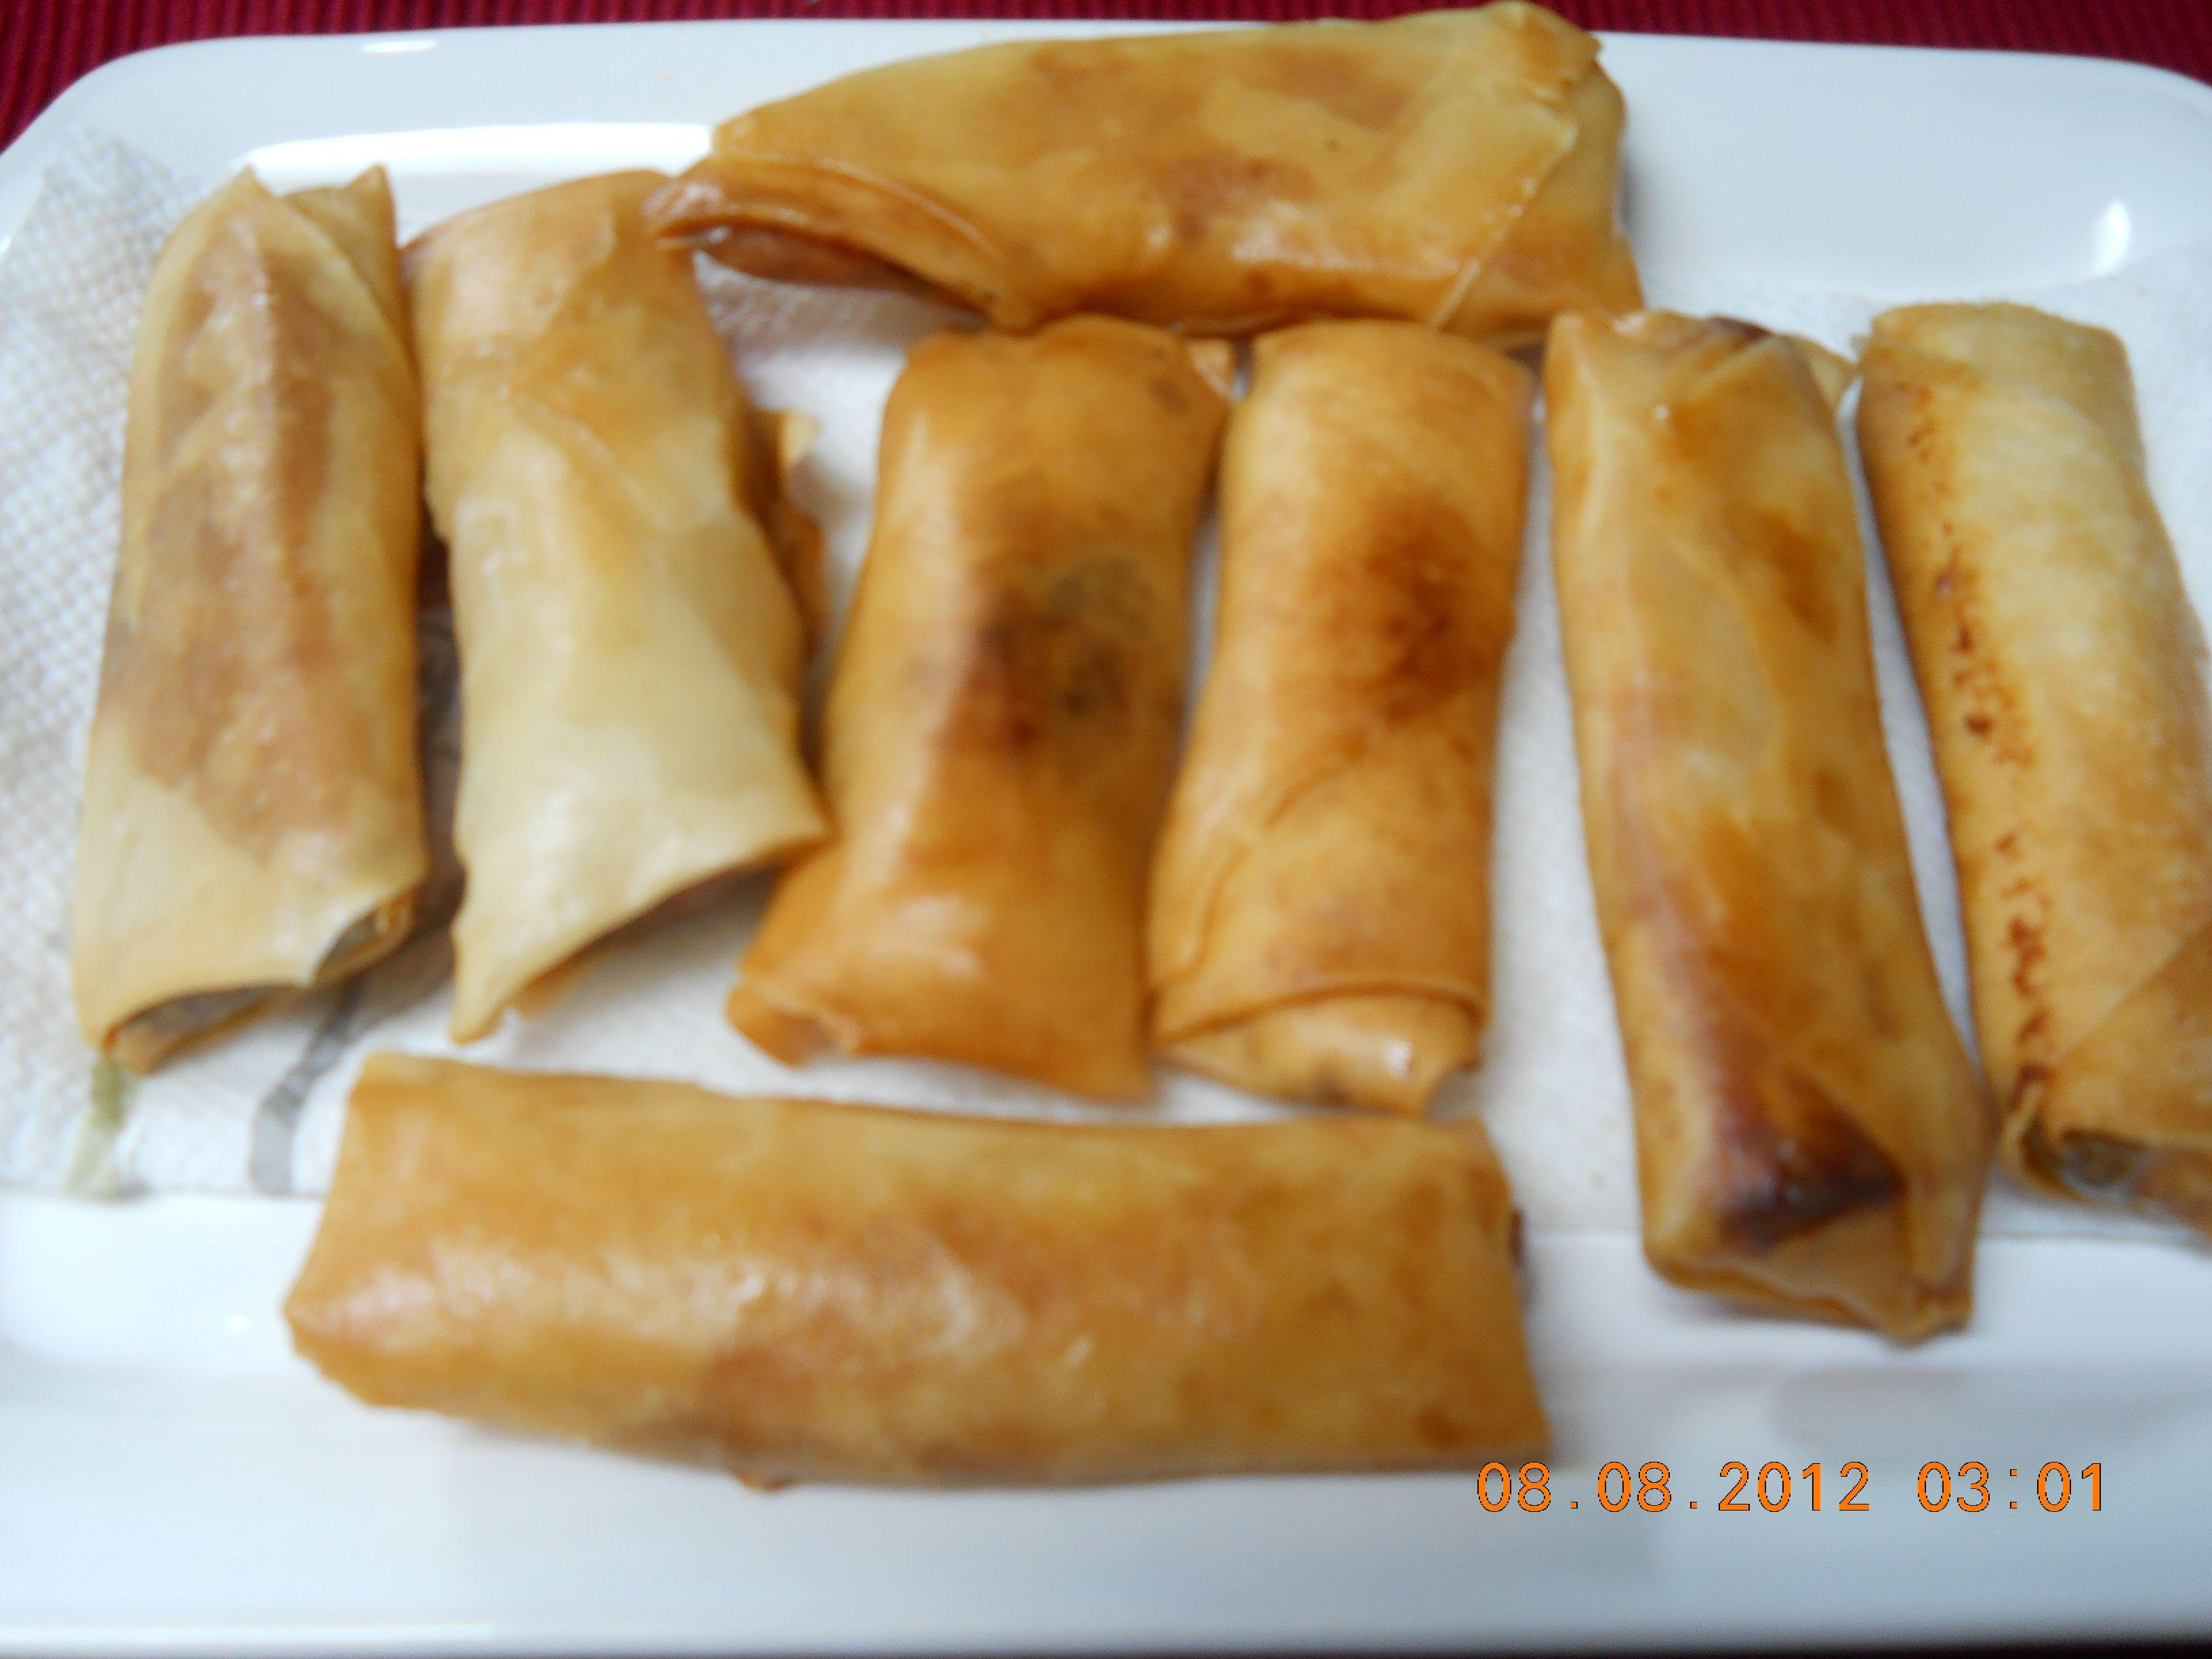 filipino classic dessert banana fritters or toron banana fritters classic desserts favorite recipes favorite recipes